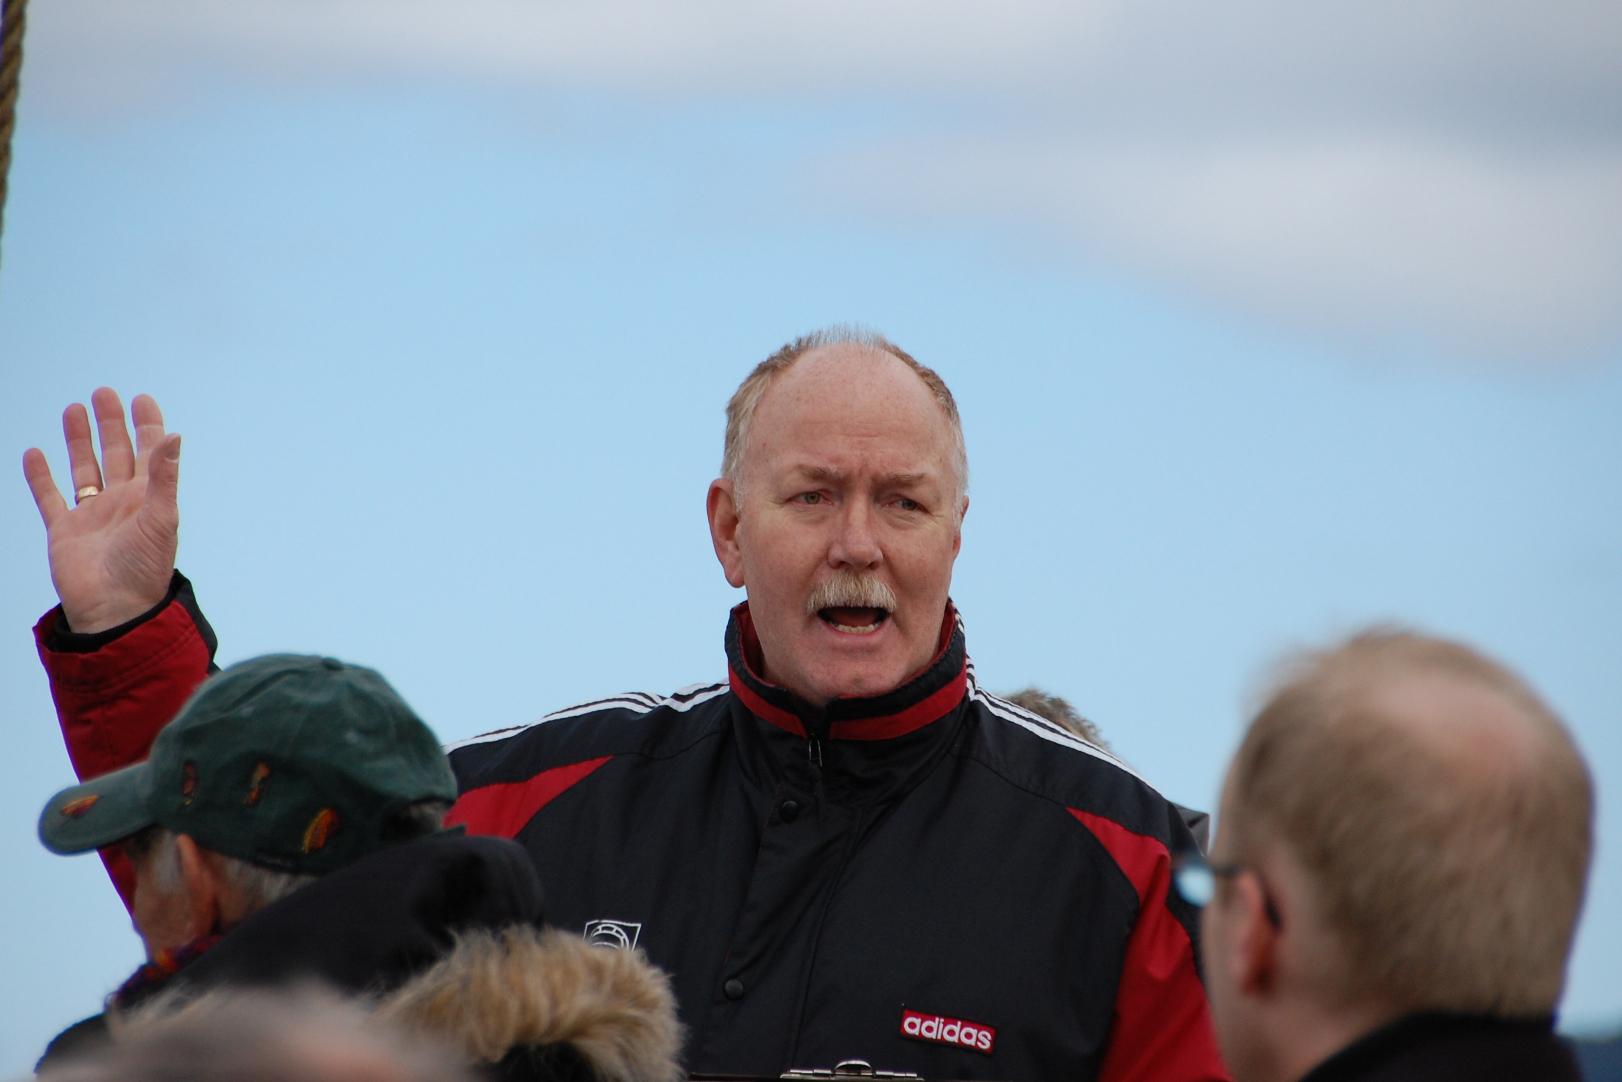 Jonny Lyngstad som guide